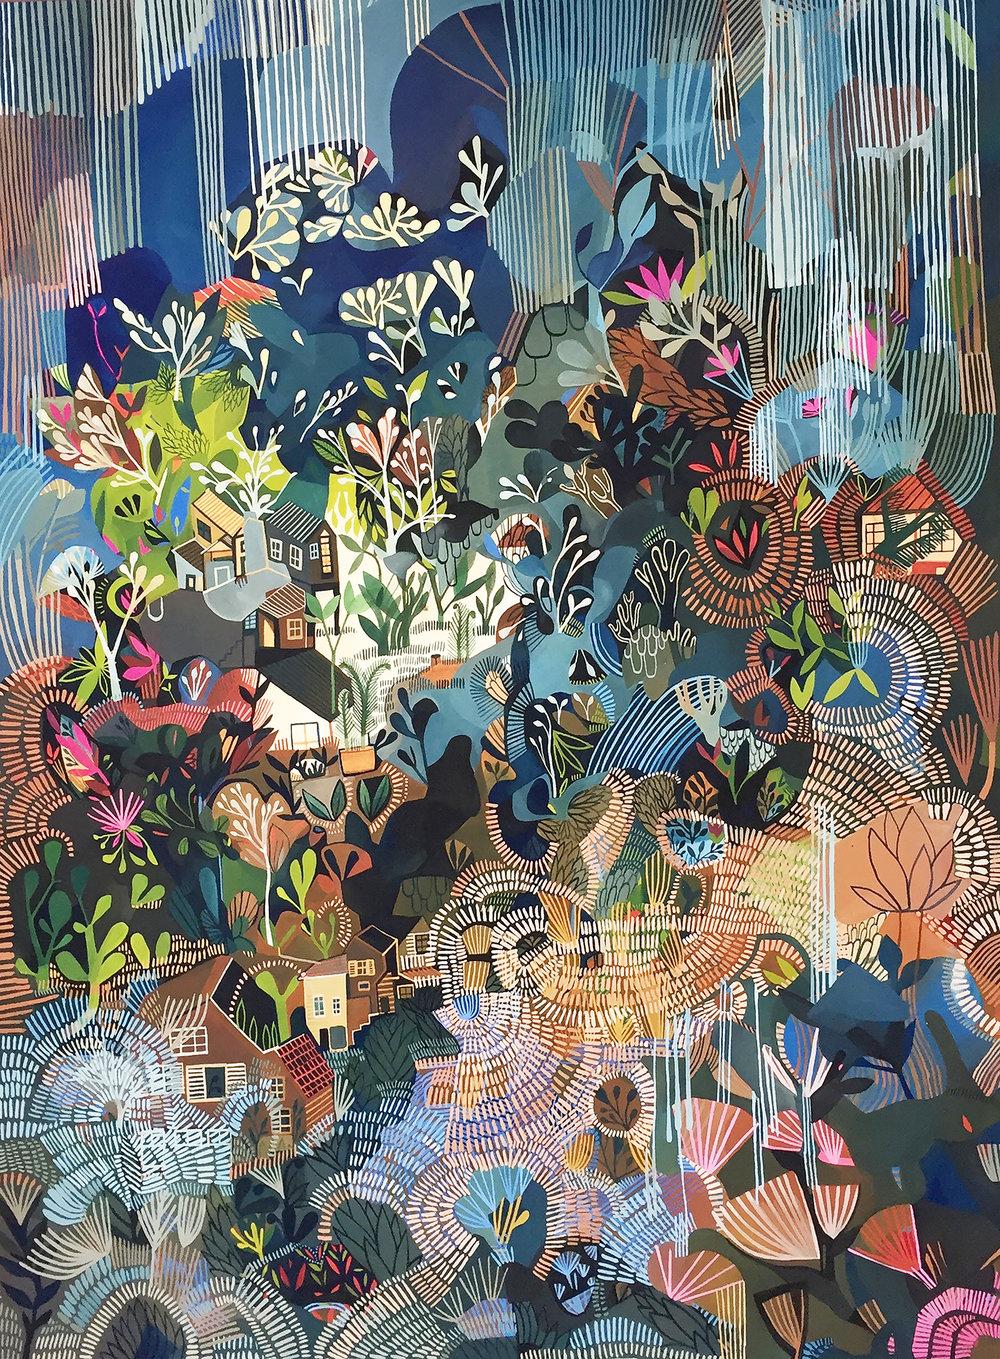 Rainforest , Ashley Amery, 2018, Gouache on paper, 56 x 76 cm